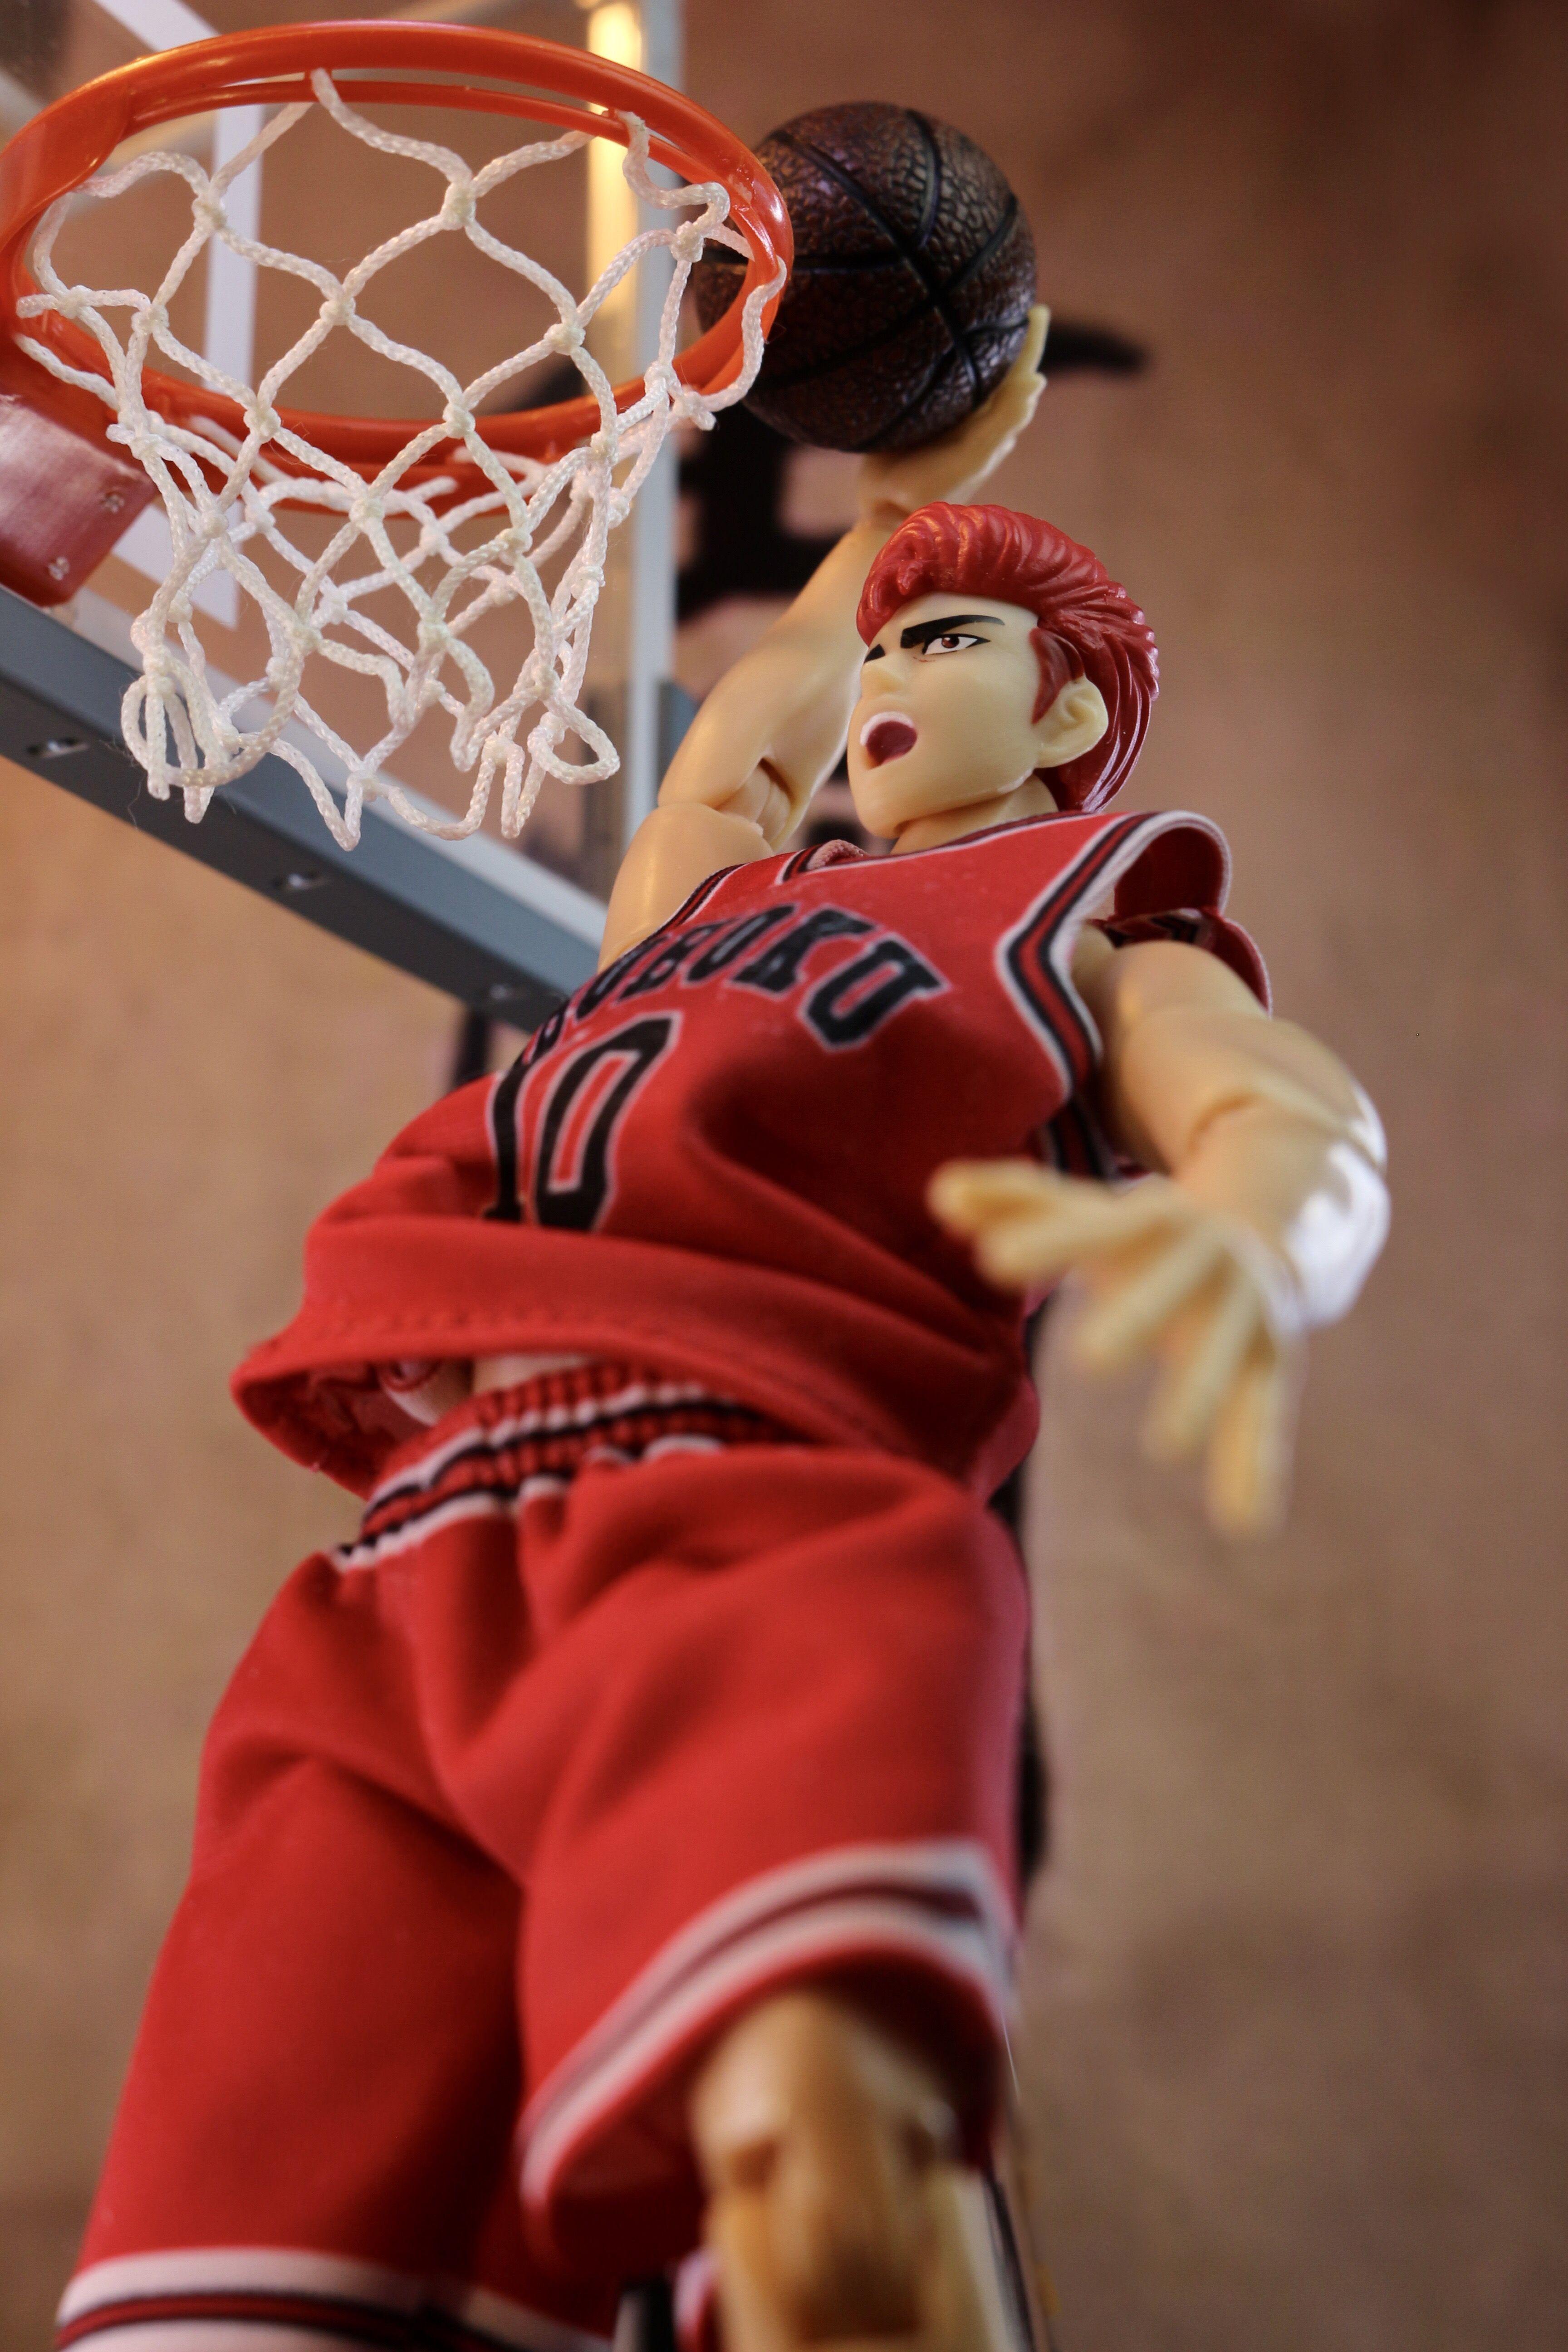 Slam Dunk Anime characters, Action figures, Figures